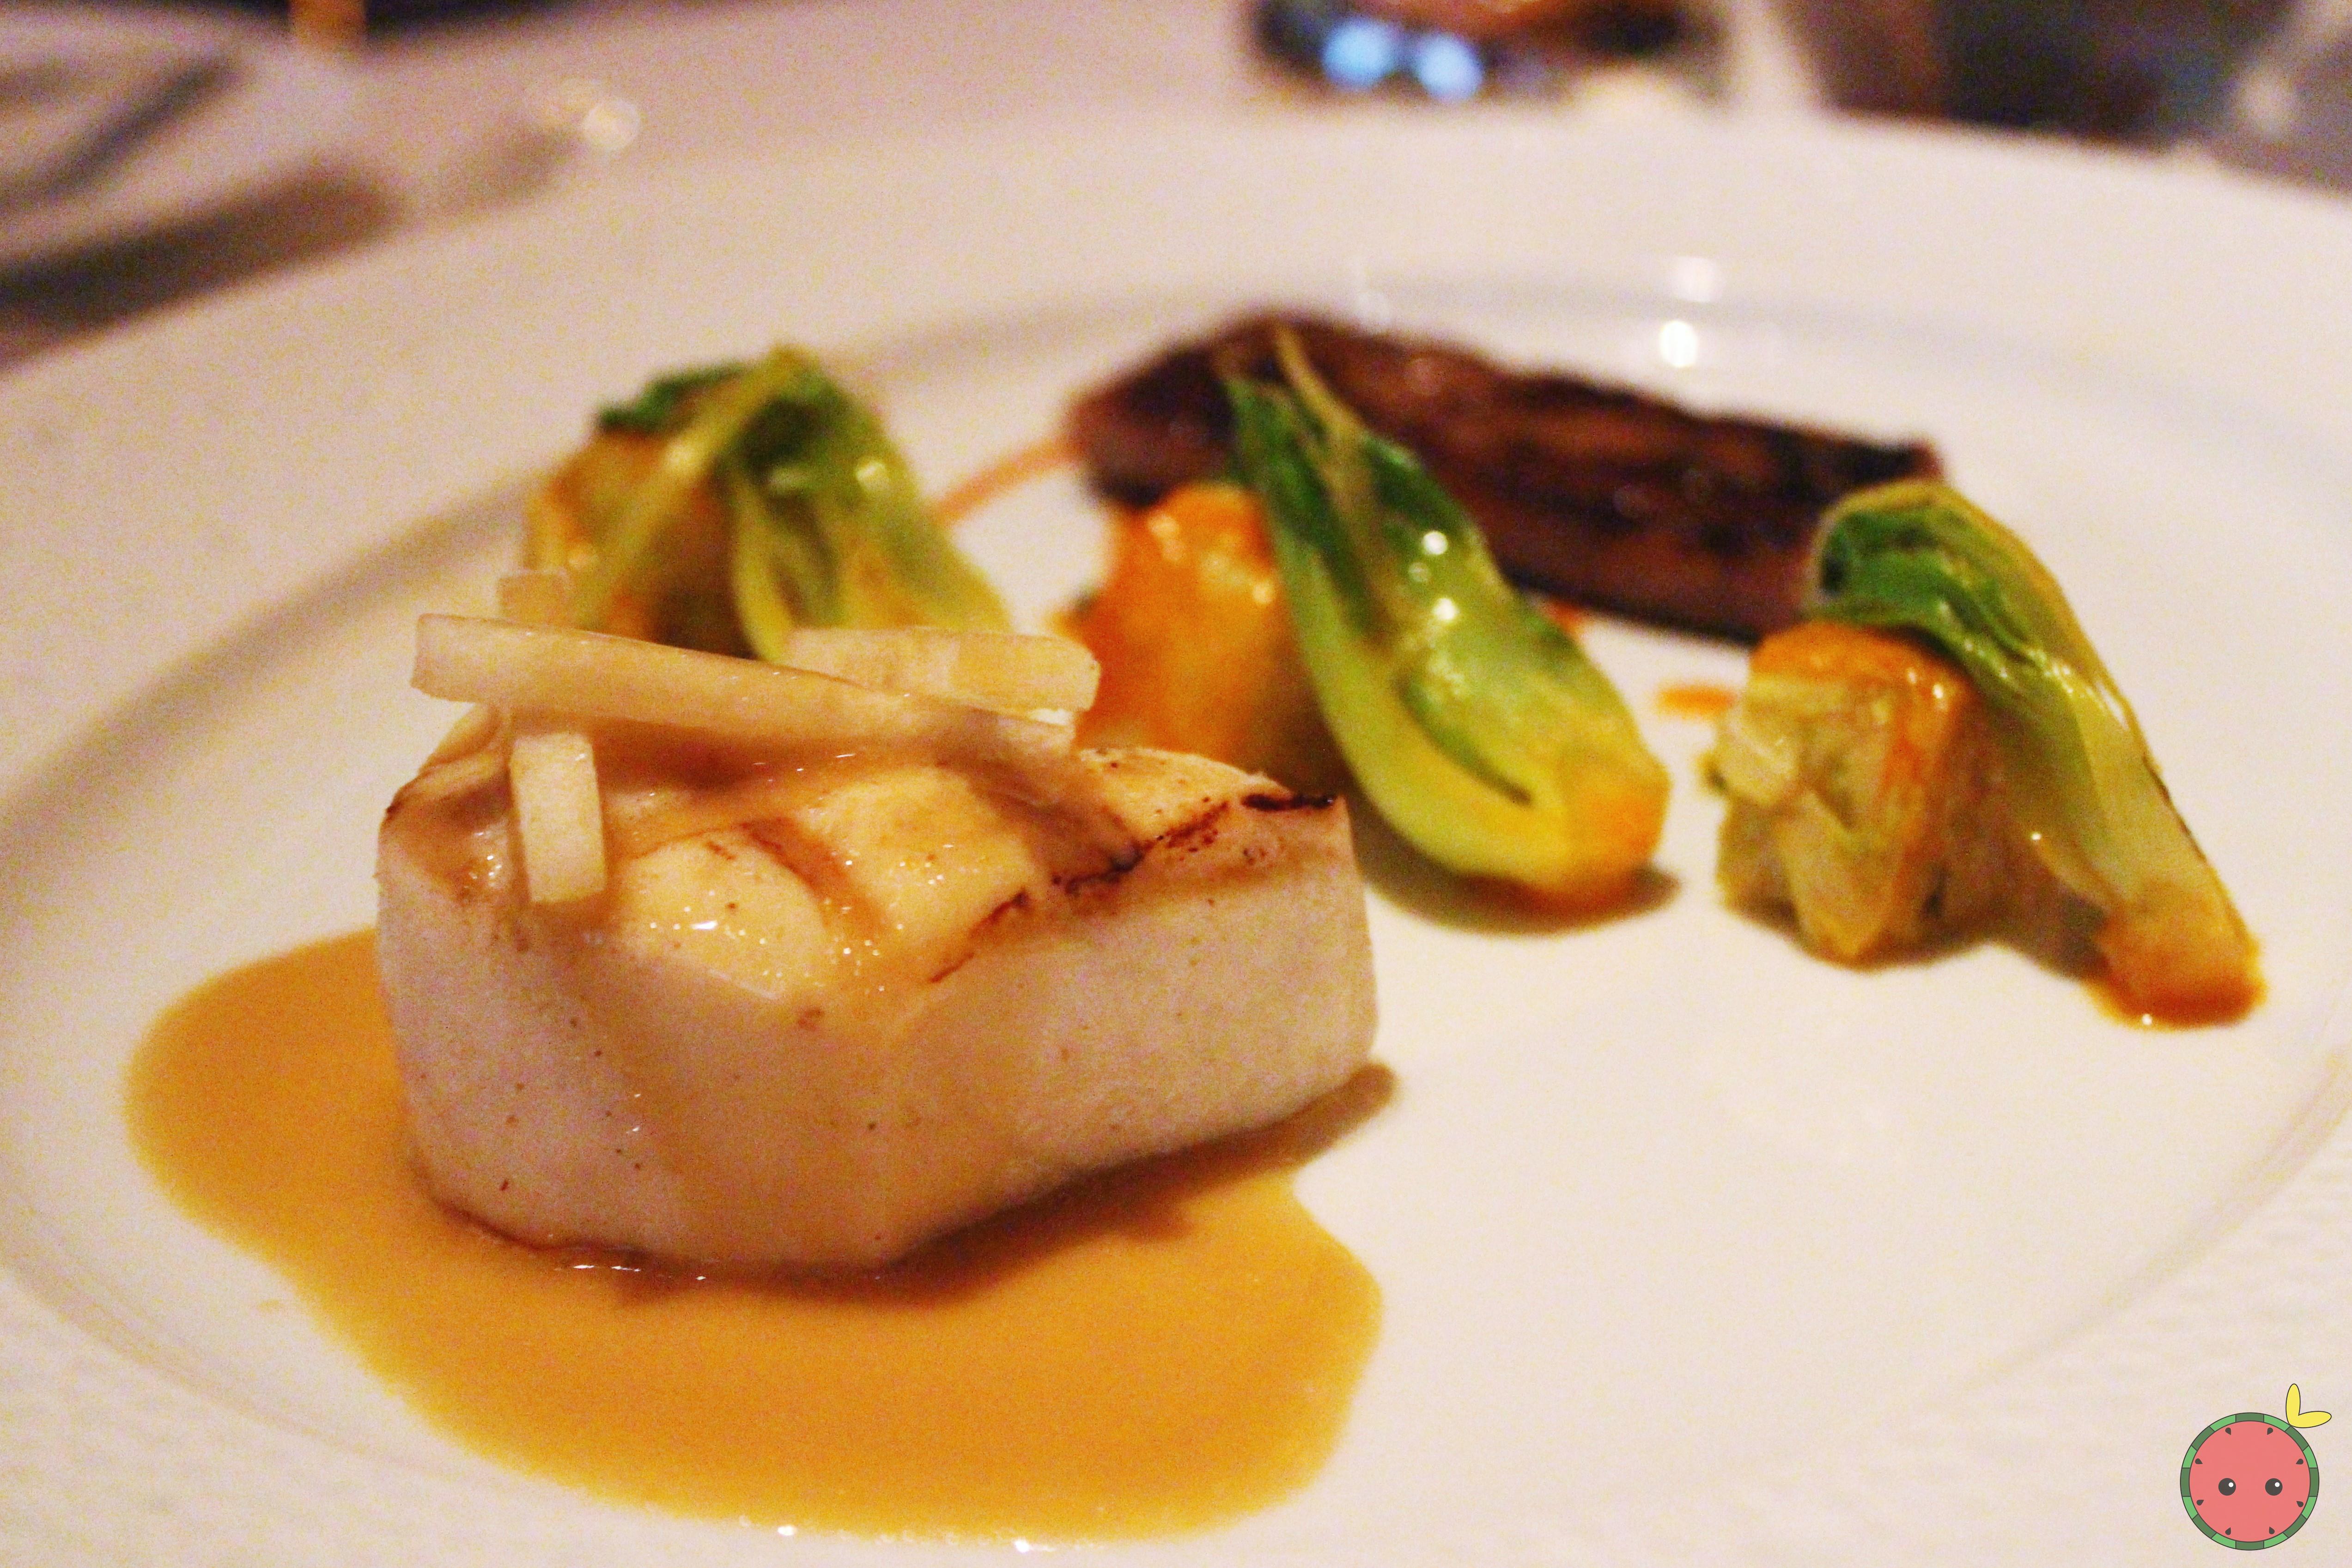 White Tuna & Japanese Wagyu - Grilled escolar and seared wagyu beef; fresh kimchi  Asian pear, soy-c